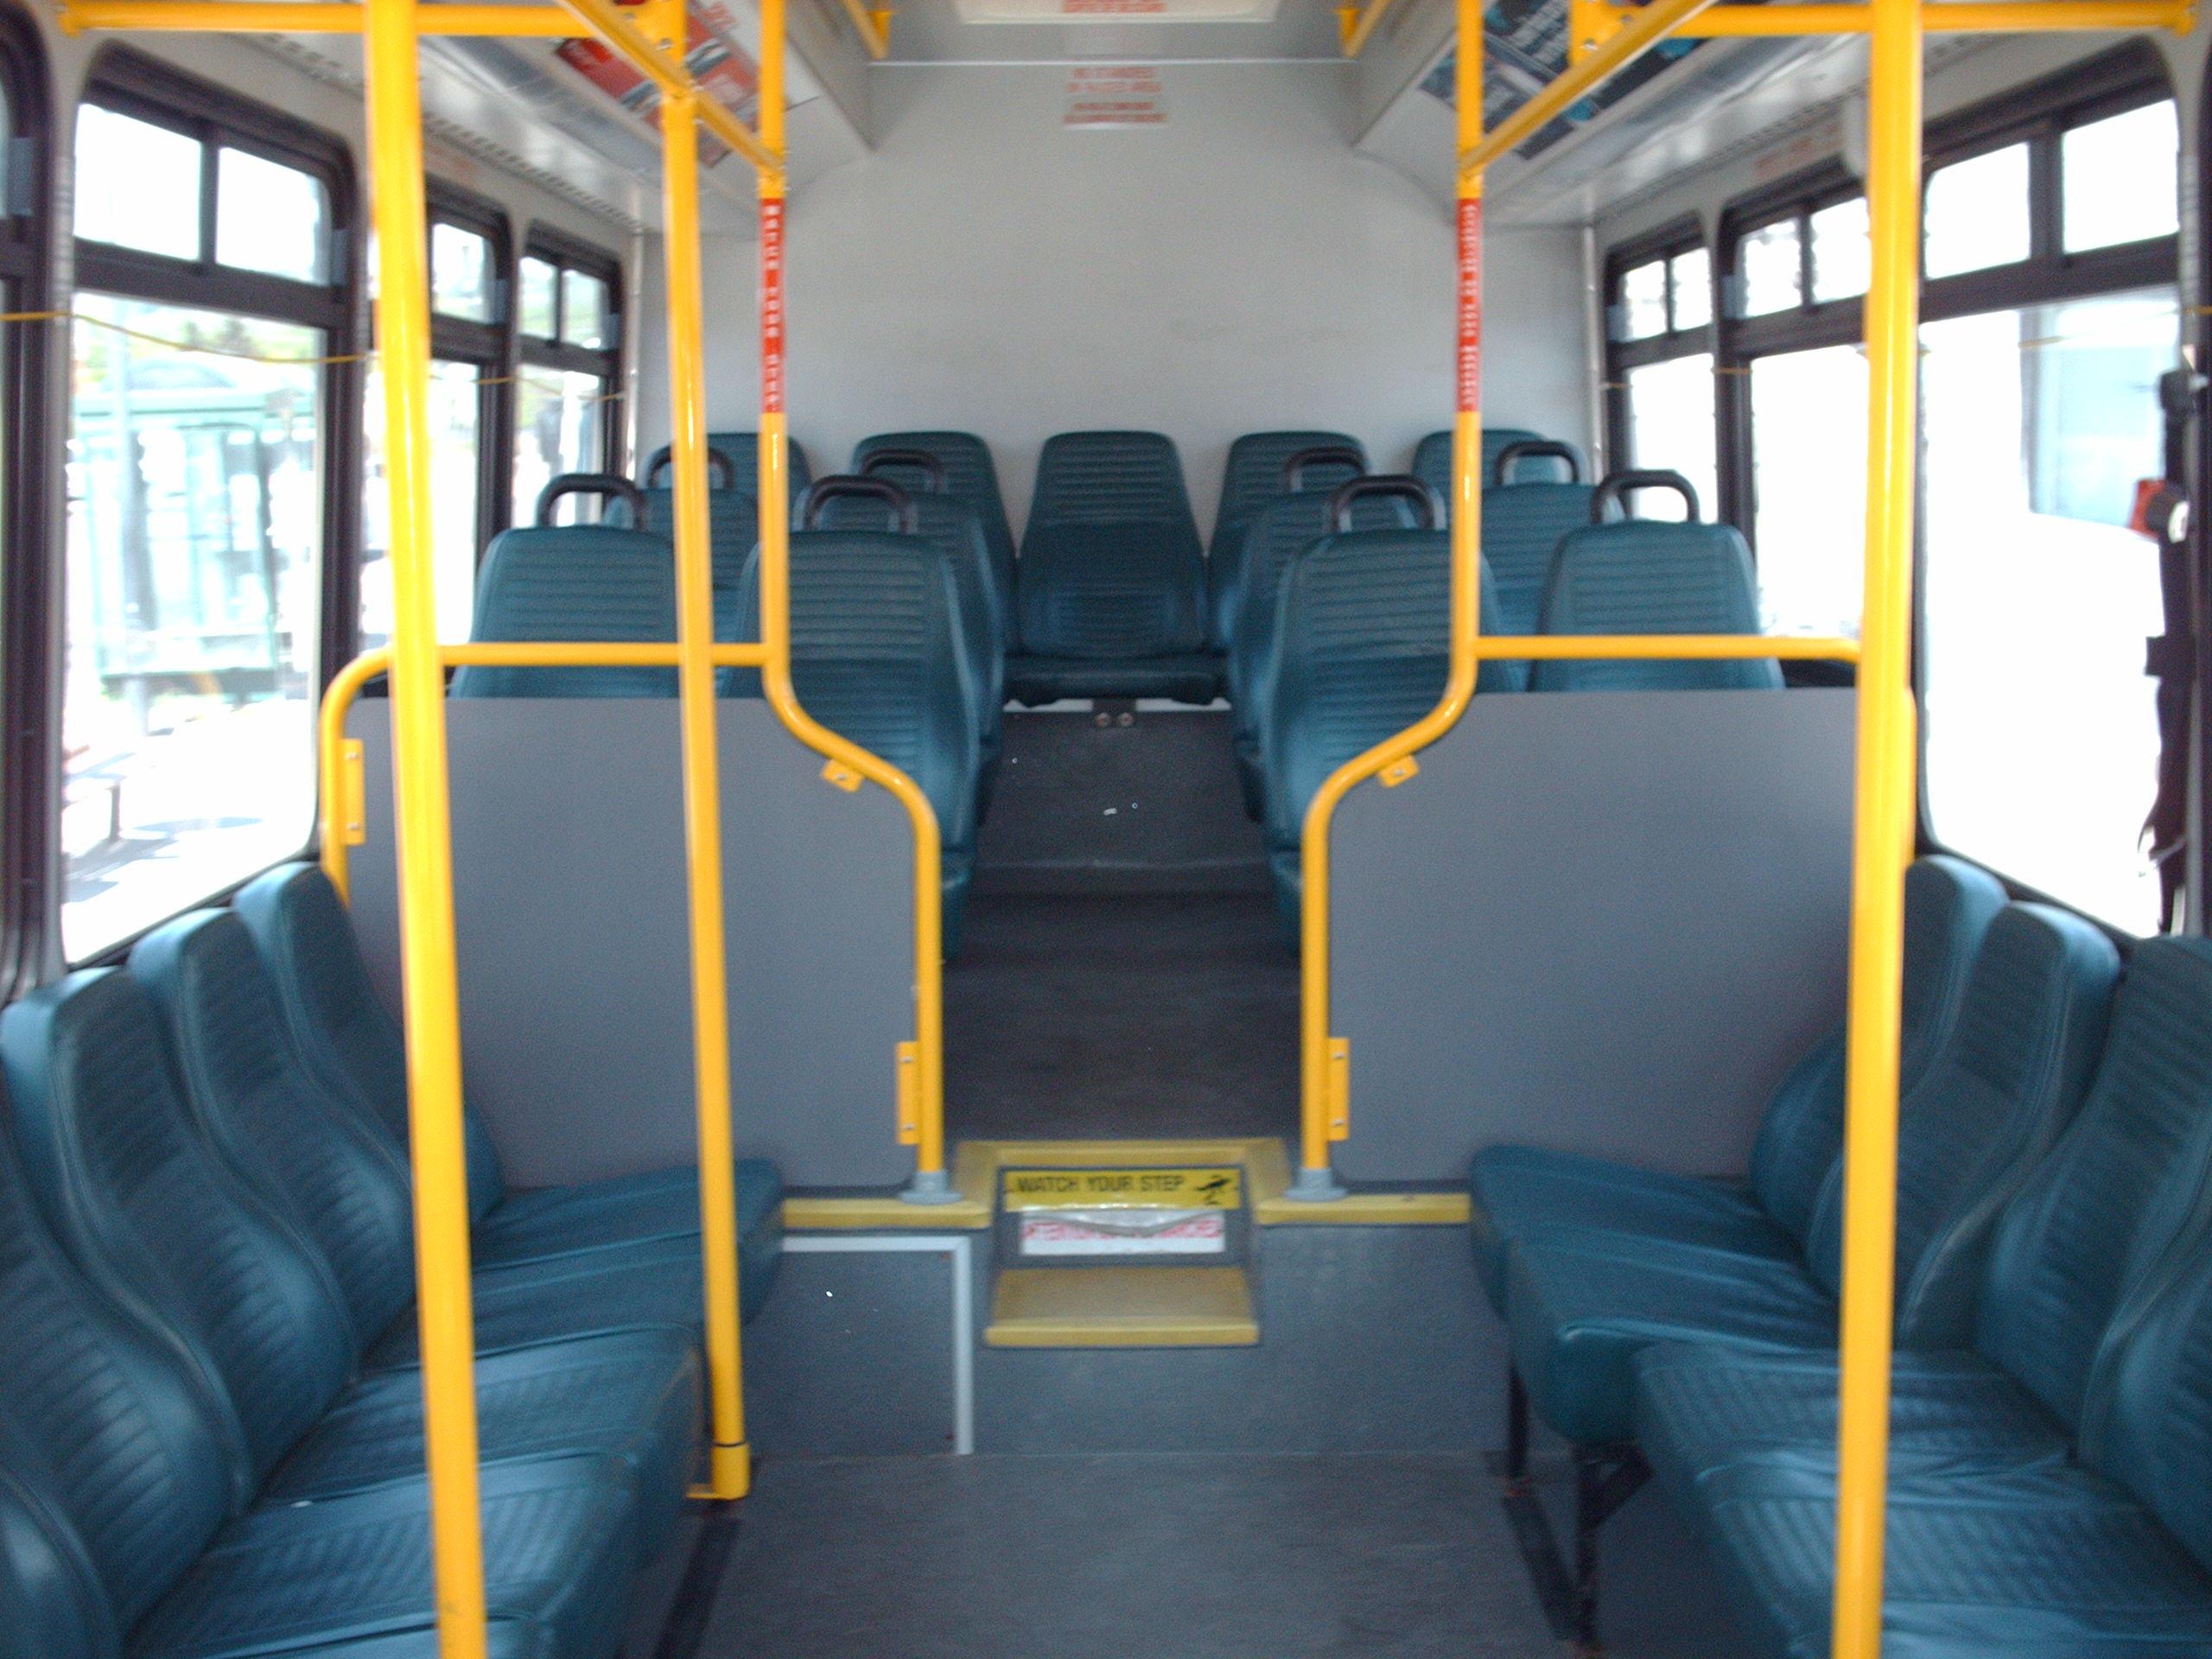 Buses_Winnipeg_p2_056.JPG